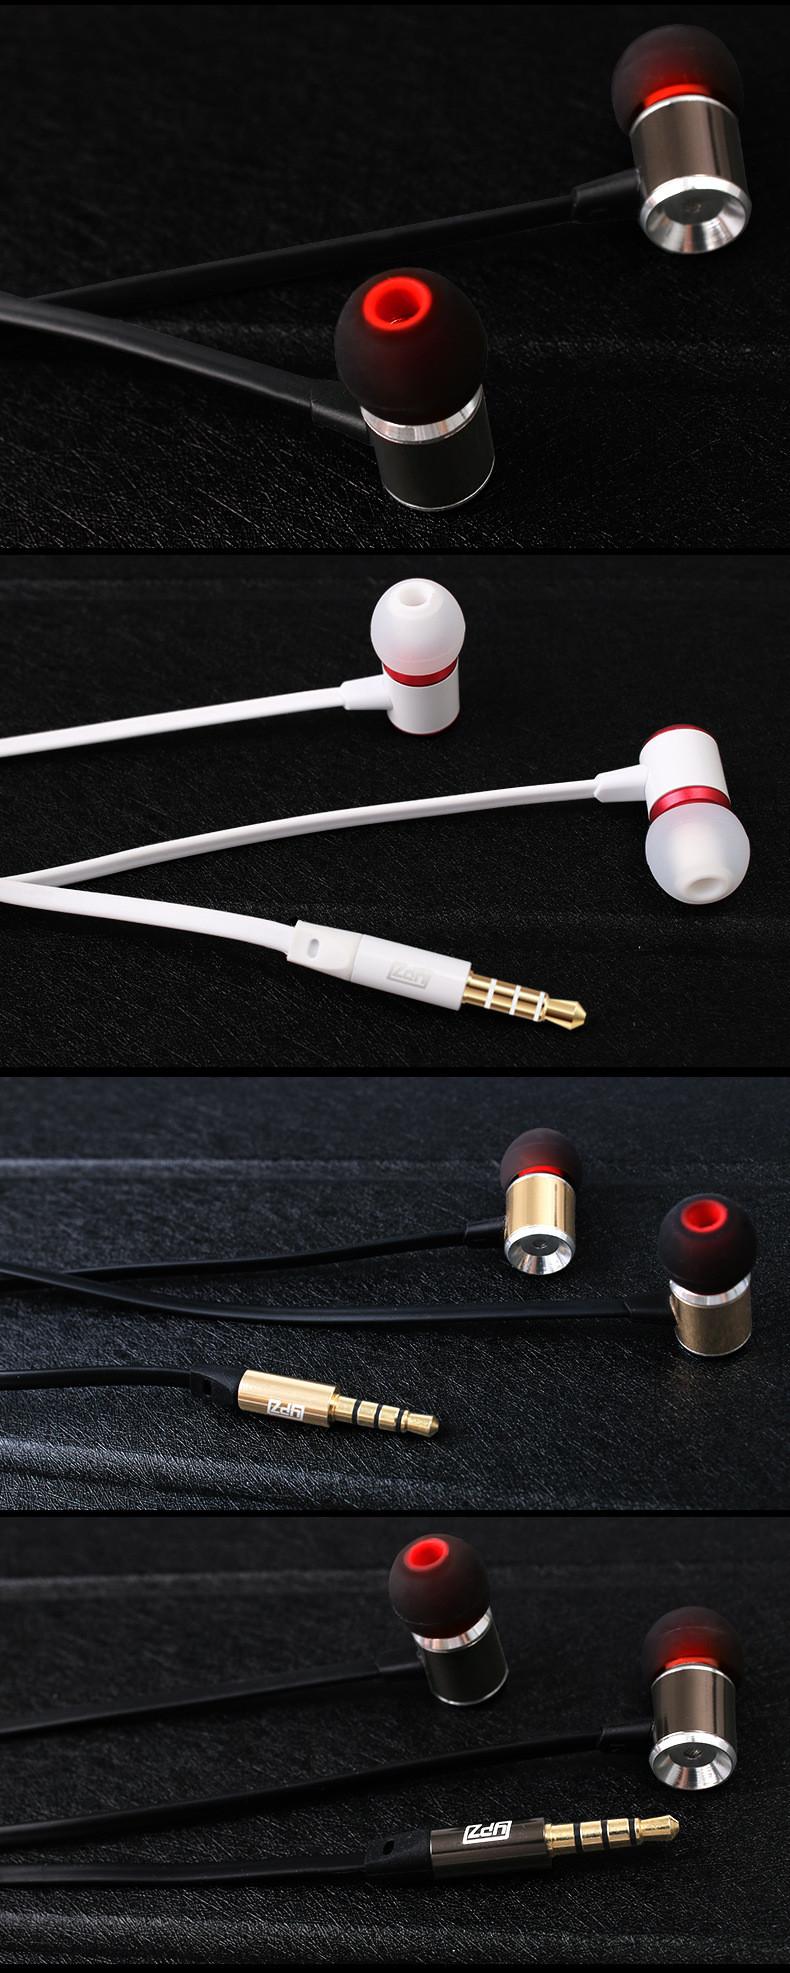 Professional Earphone Heavy Bass Music Earpiece for HP Envy 14-1120er Beats Edition Laptops Headset fone de ouvido With Mic